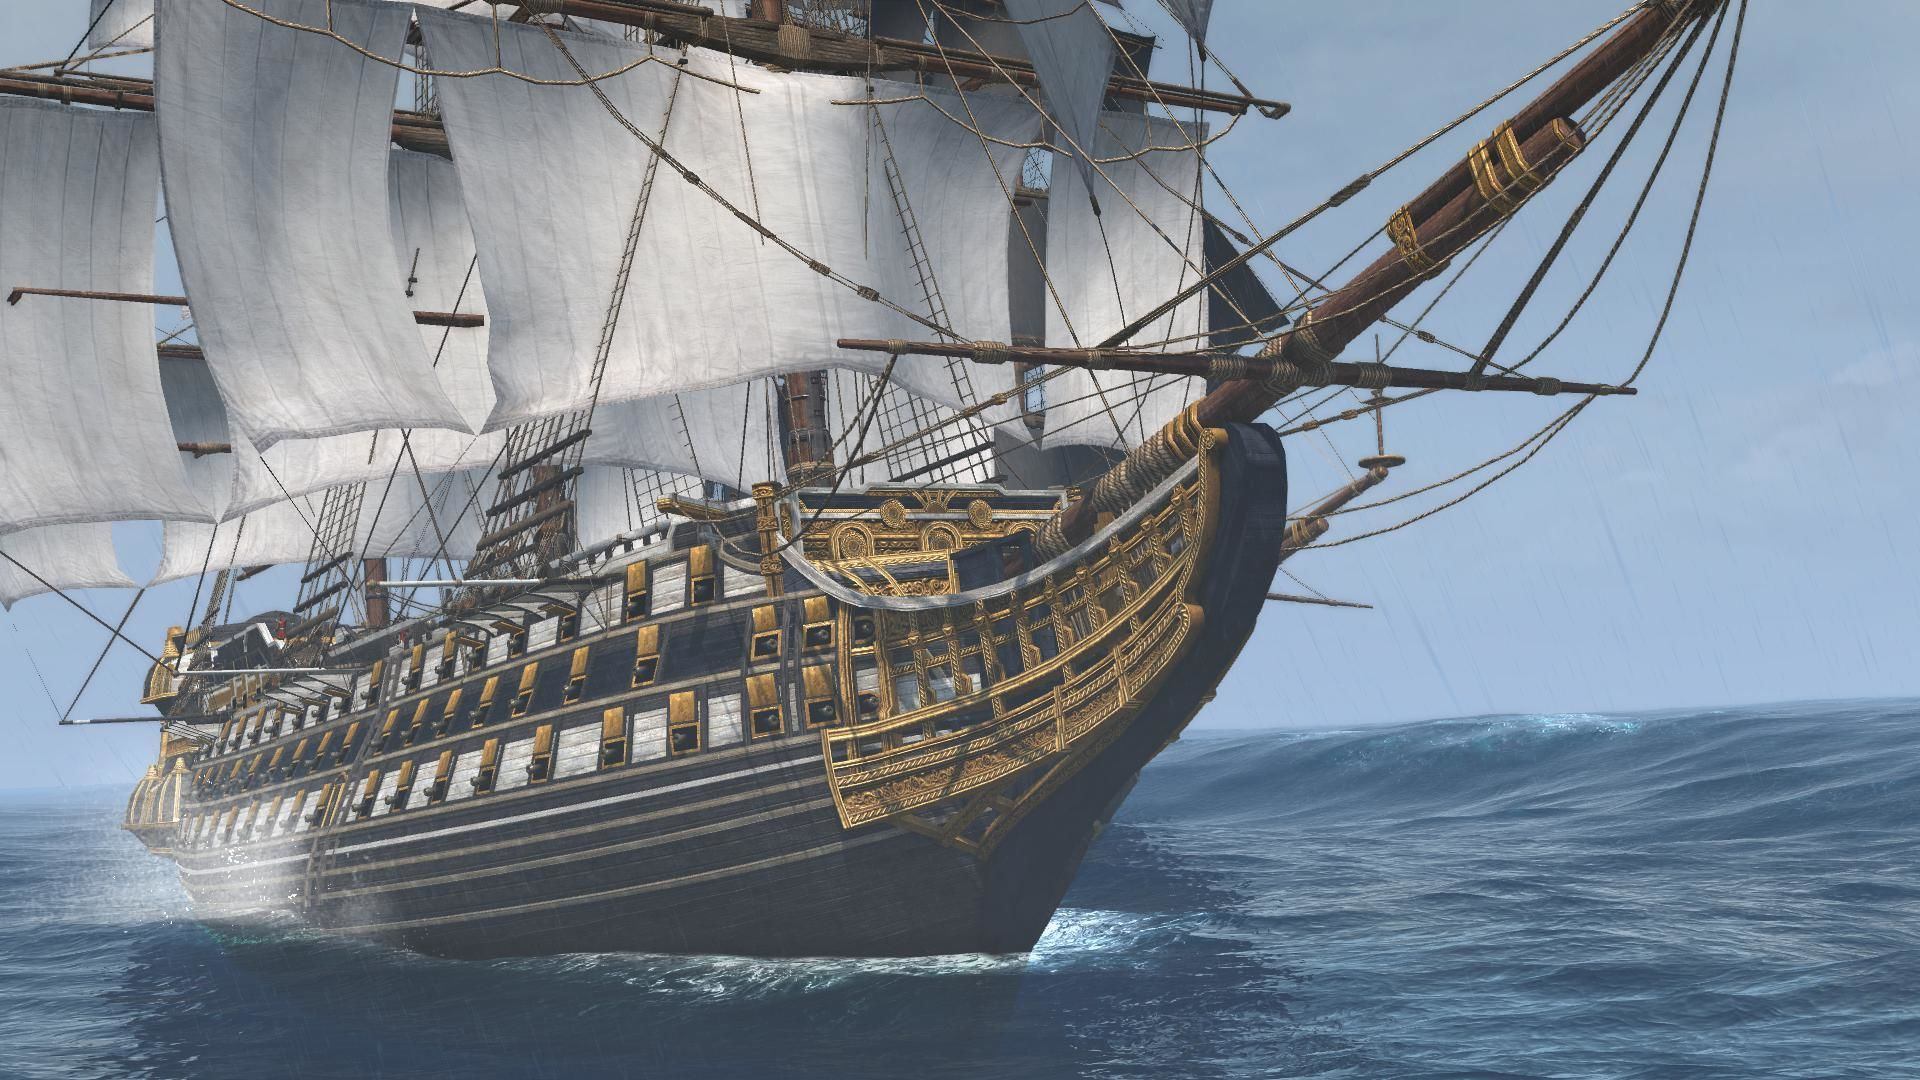 Assassin S Creed Iv Black Flag Screenshots For Windows Mobygames Assassins Creed Black Flag Assassins Creed Creed